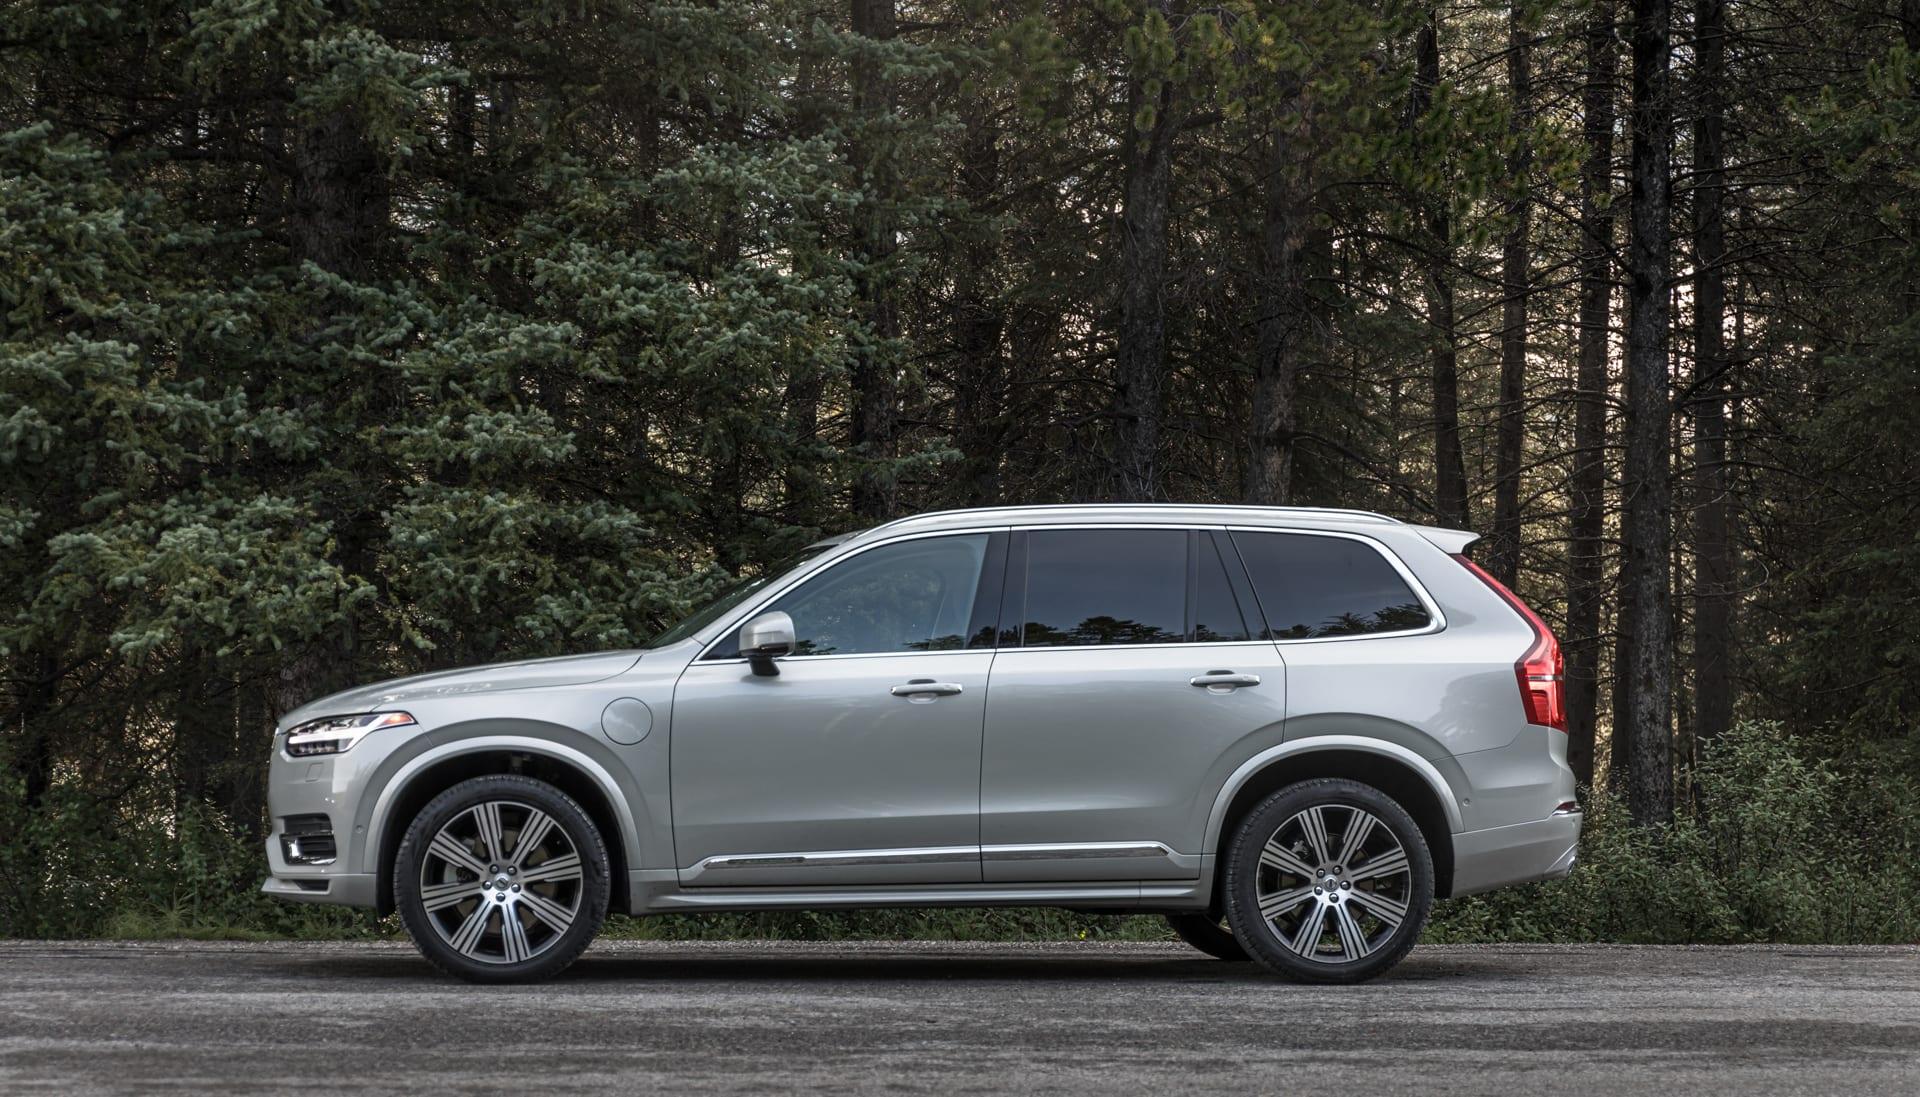 Volvo S Xc90 Brings Swedish Minimalism To A Sea Of Luxury Suvs